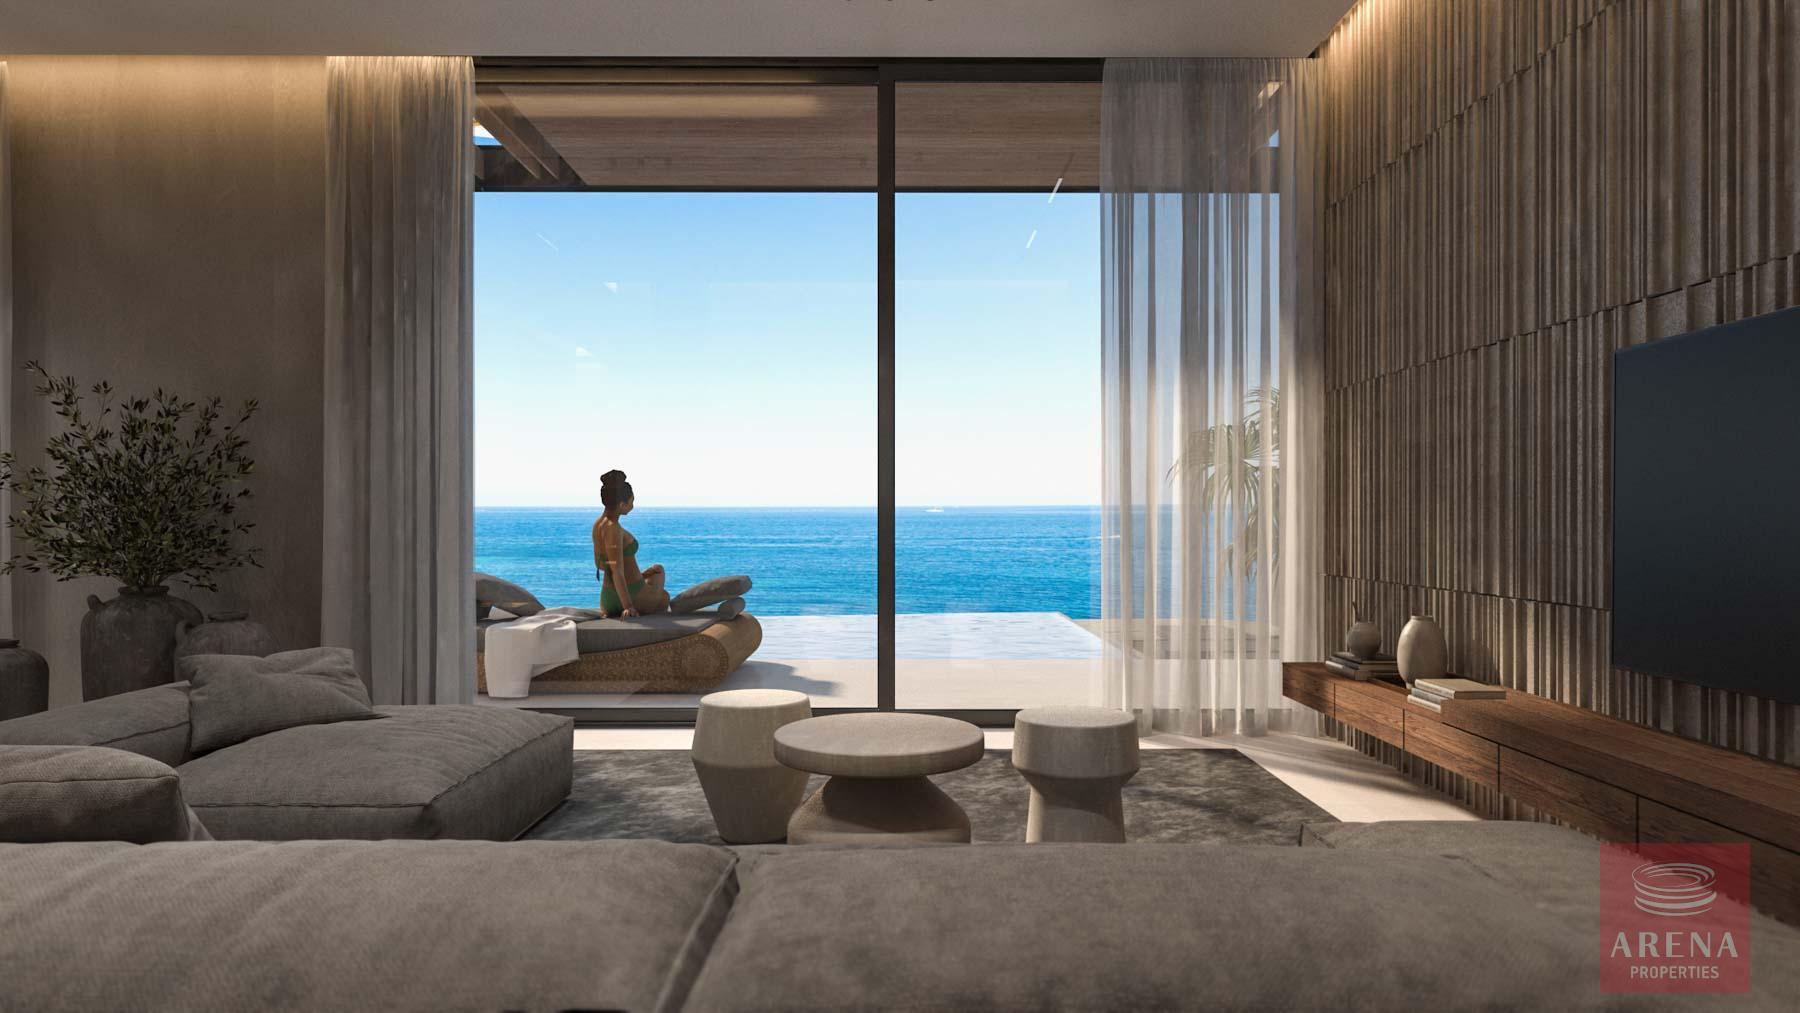 4 Bed Seafron Villa in Kapparis - sitting area